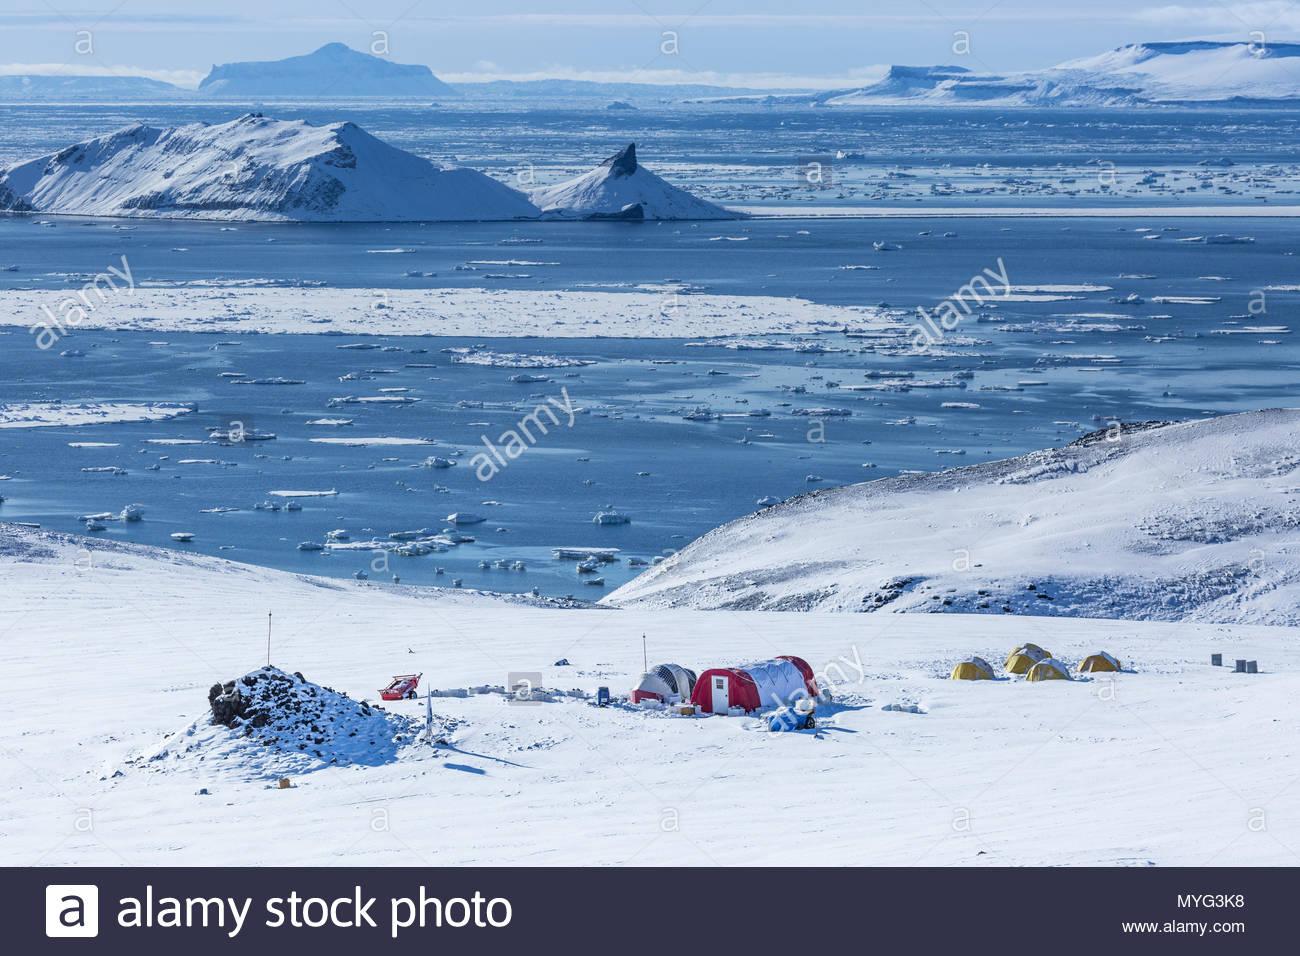 View of a scientific campsite in Antarctica. - Stock Image